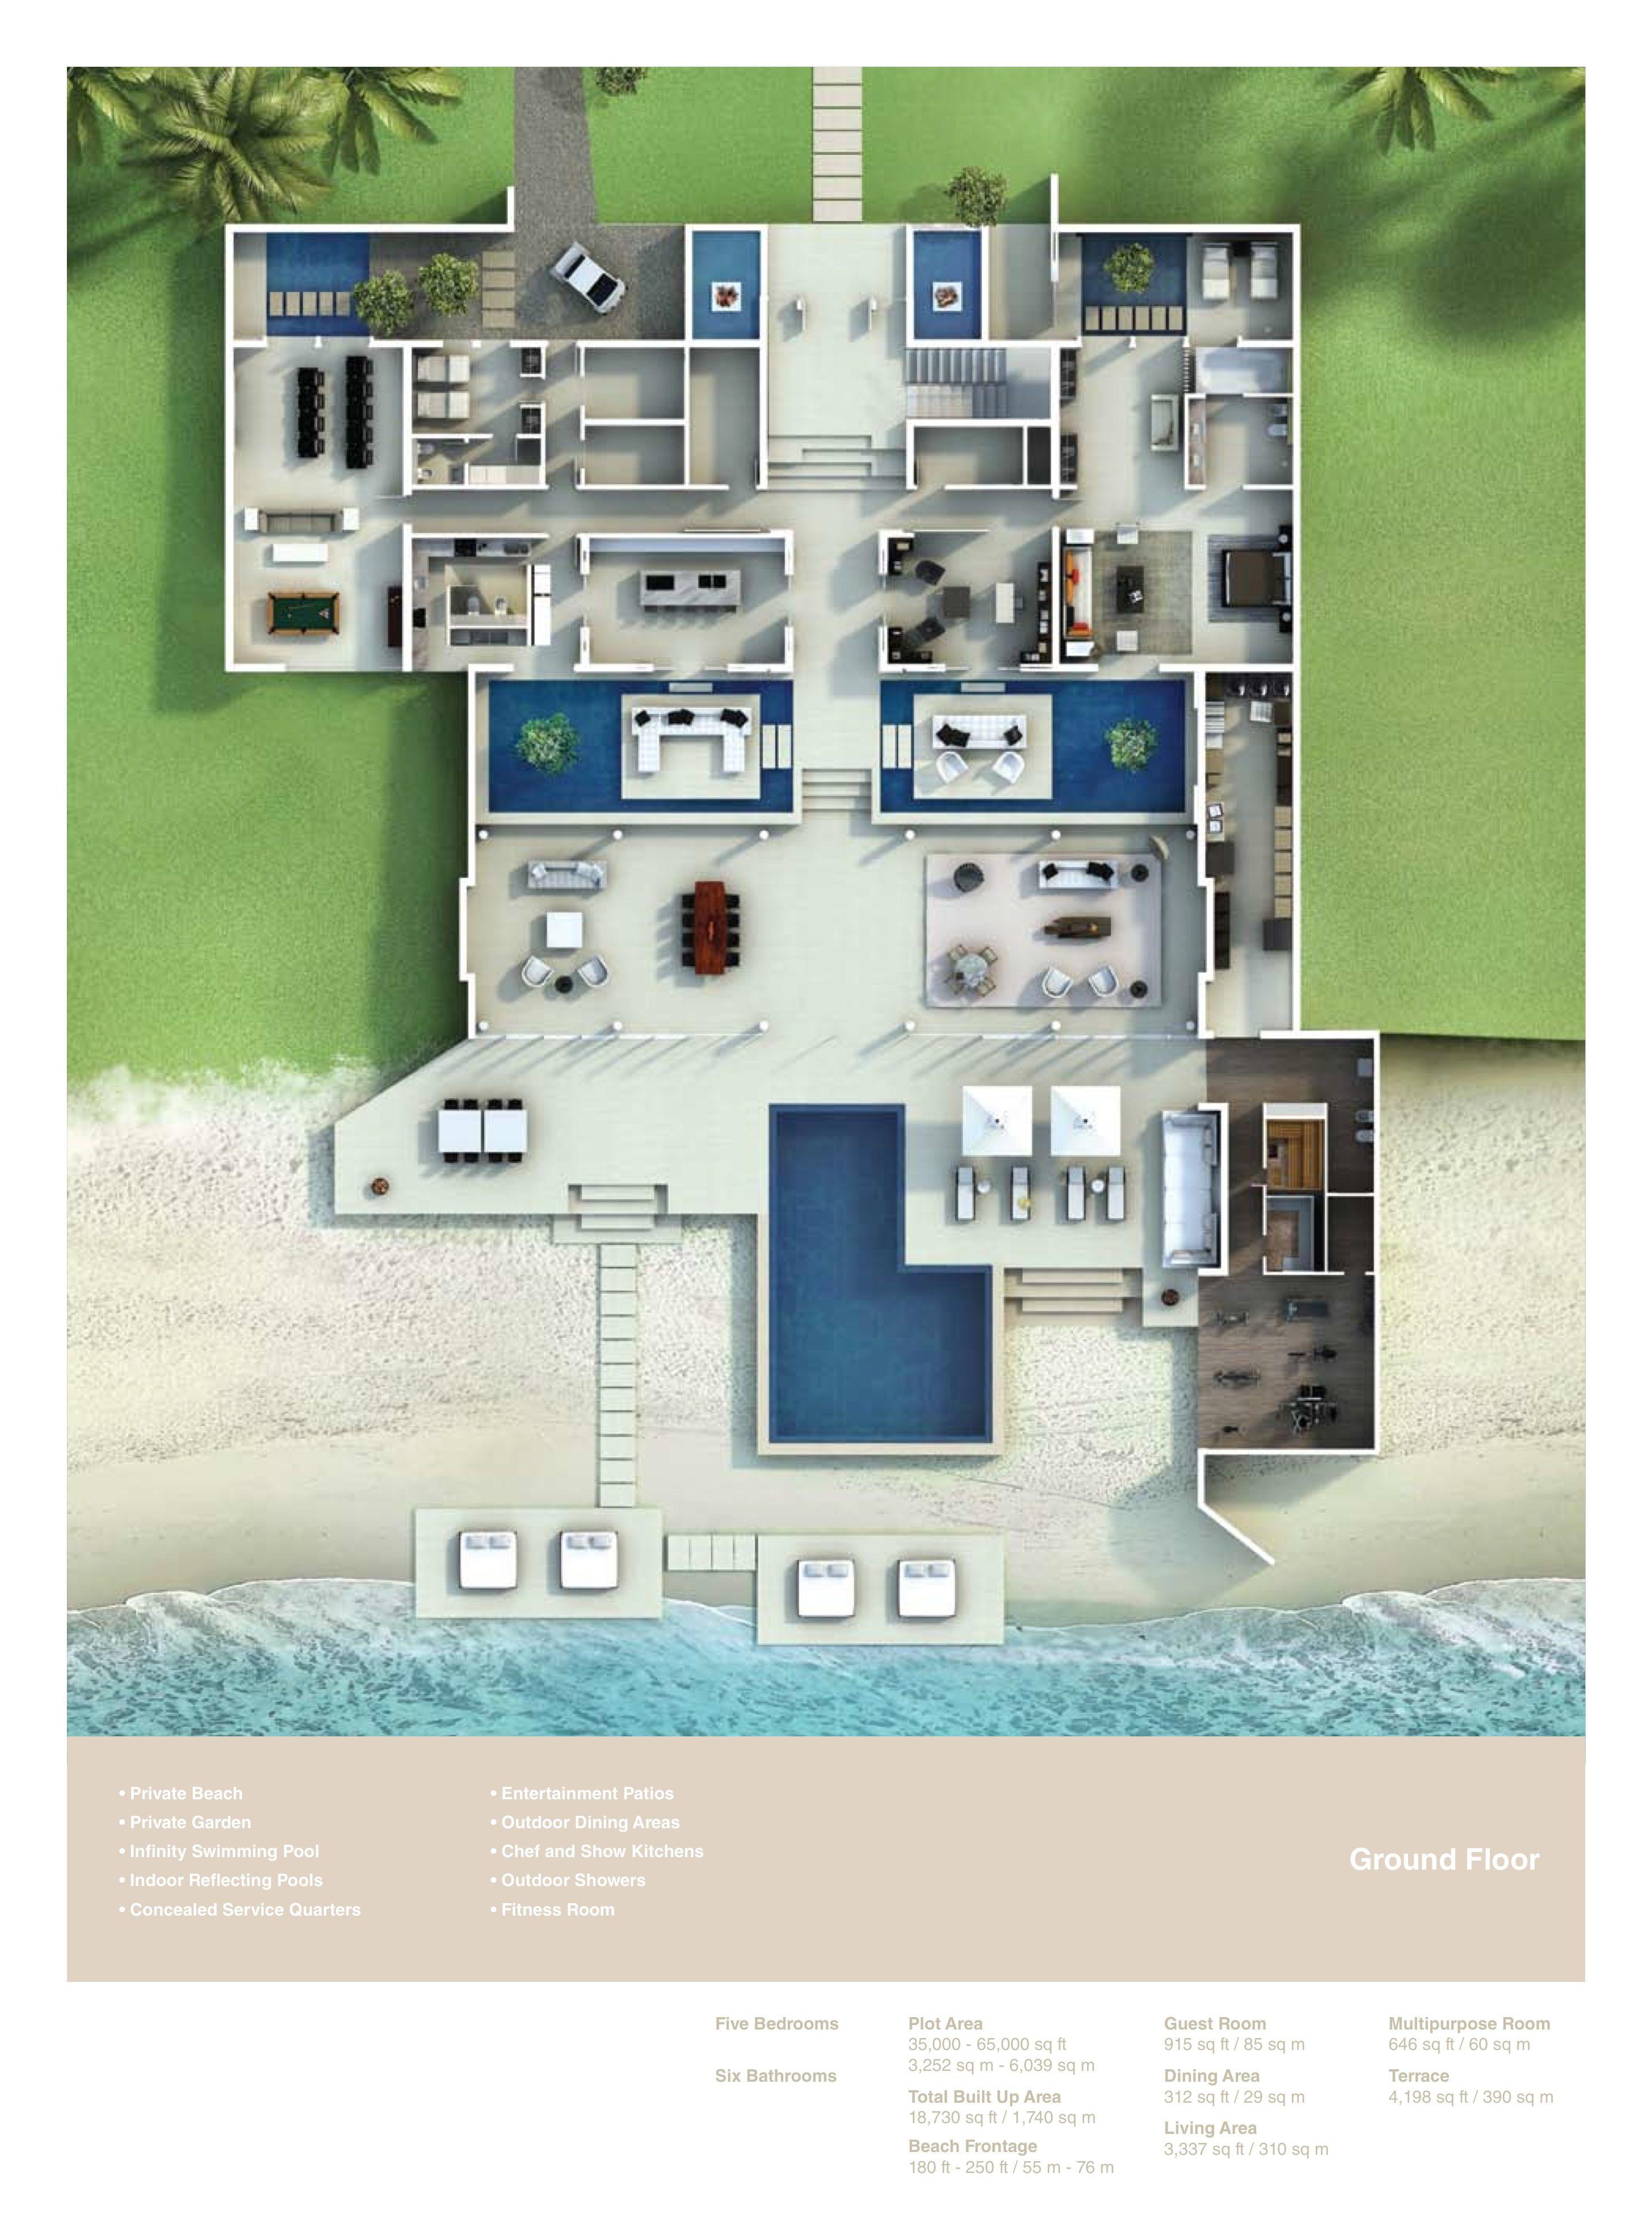 Nurai Beachfront Estate Villa Floor Plans Nurai Island Abu Dhabi Uae House Plans Mansion Beachfront House Floor Plans